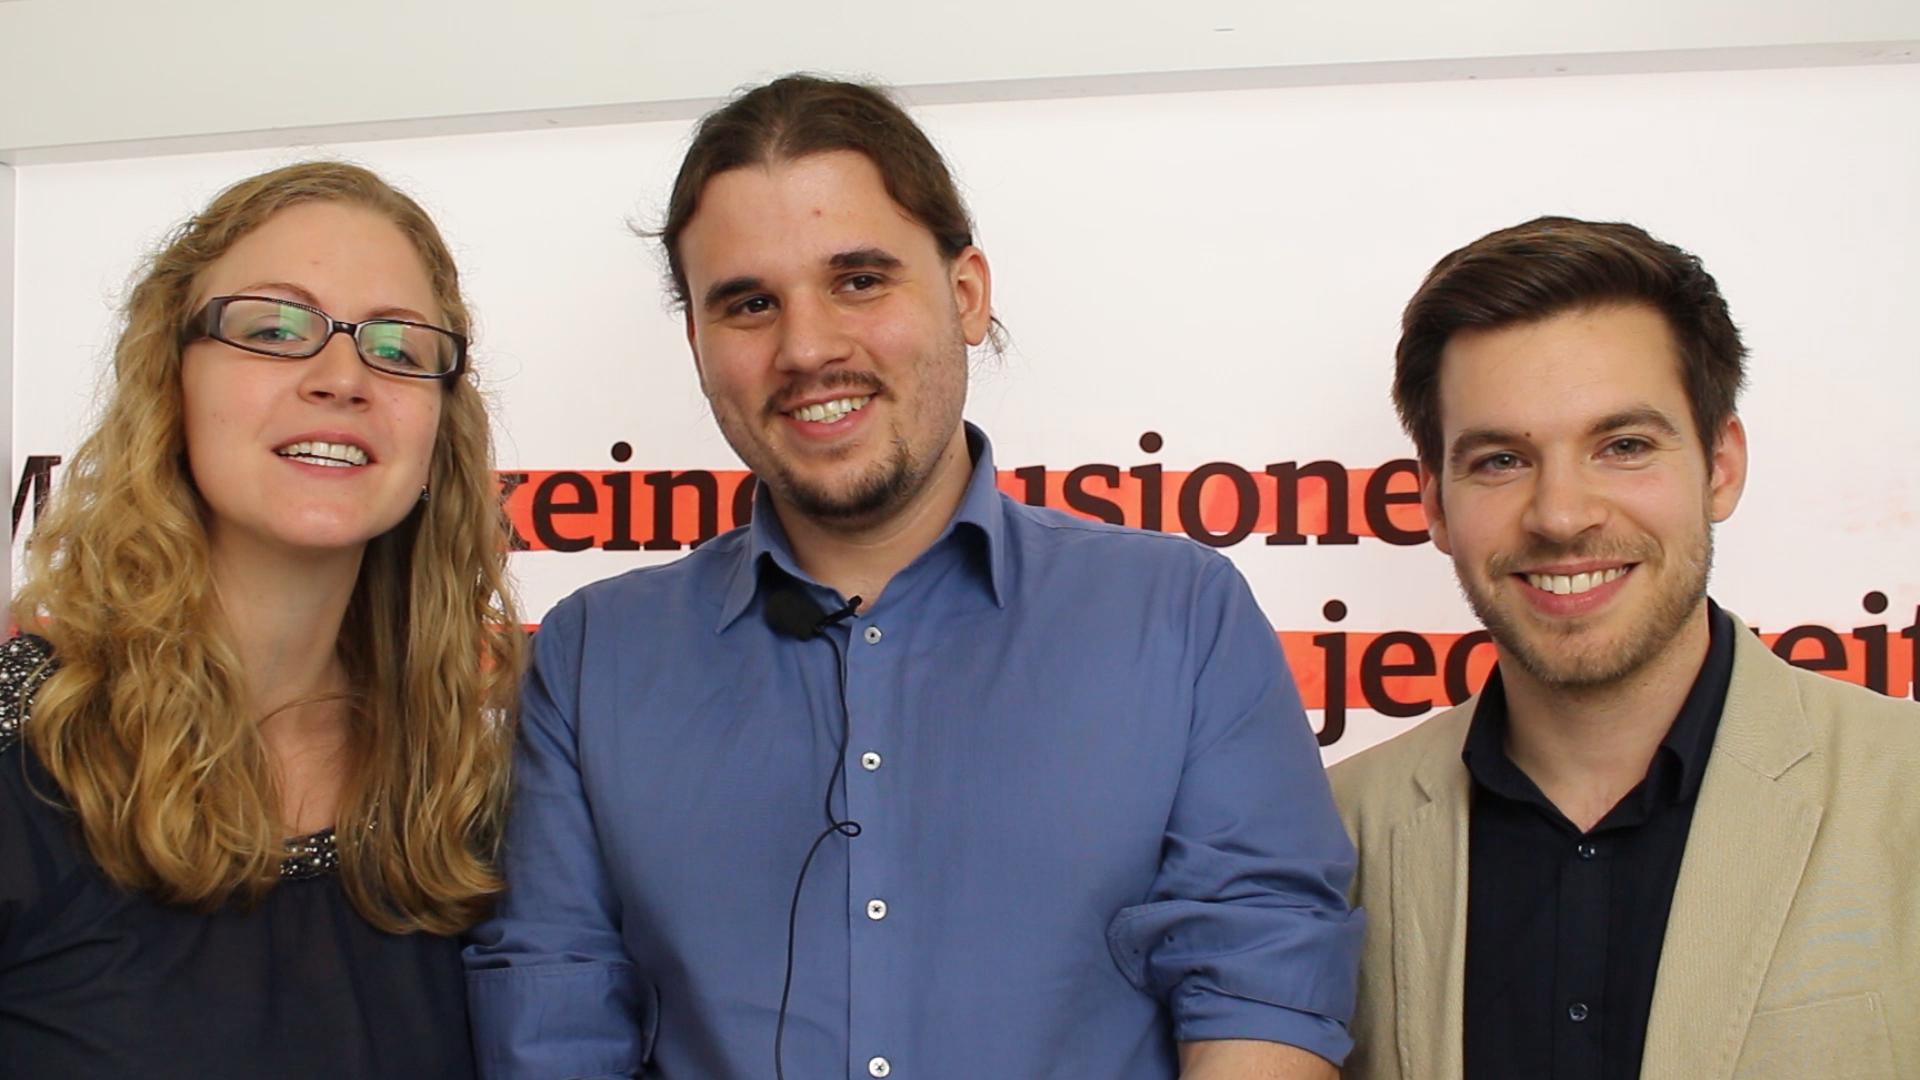 Beatrice Rech, Daniel Menzel, Stefan Schabernack